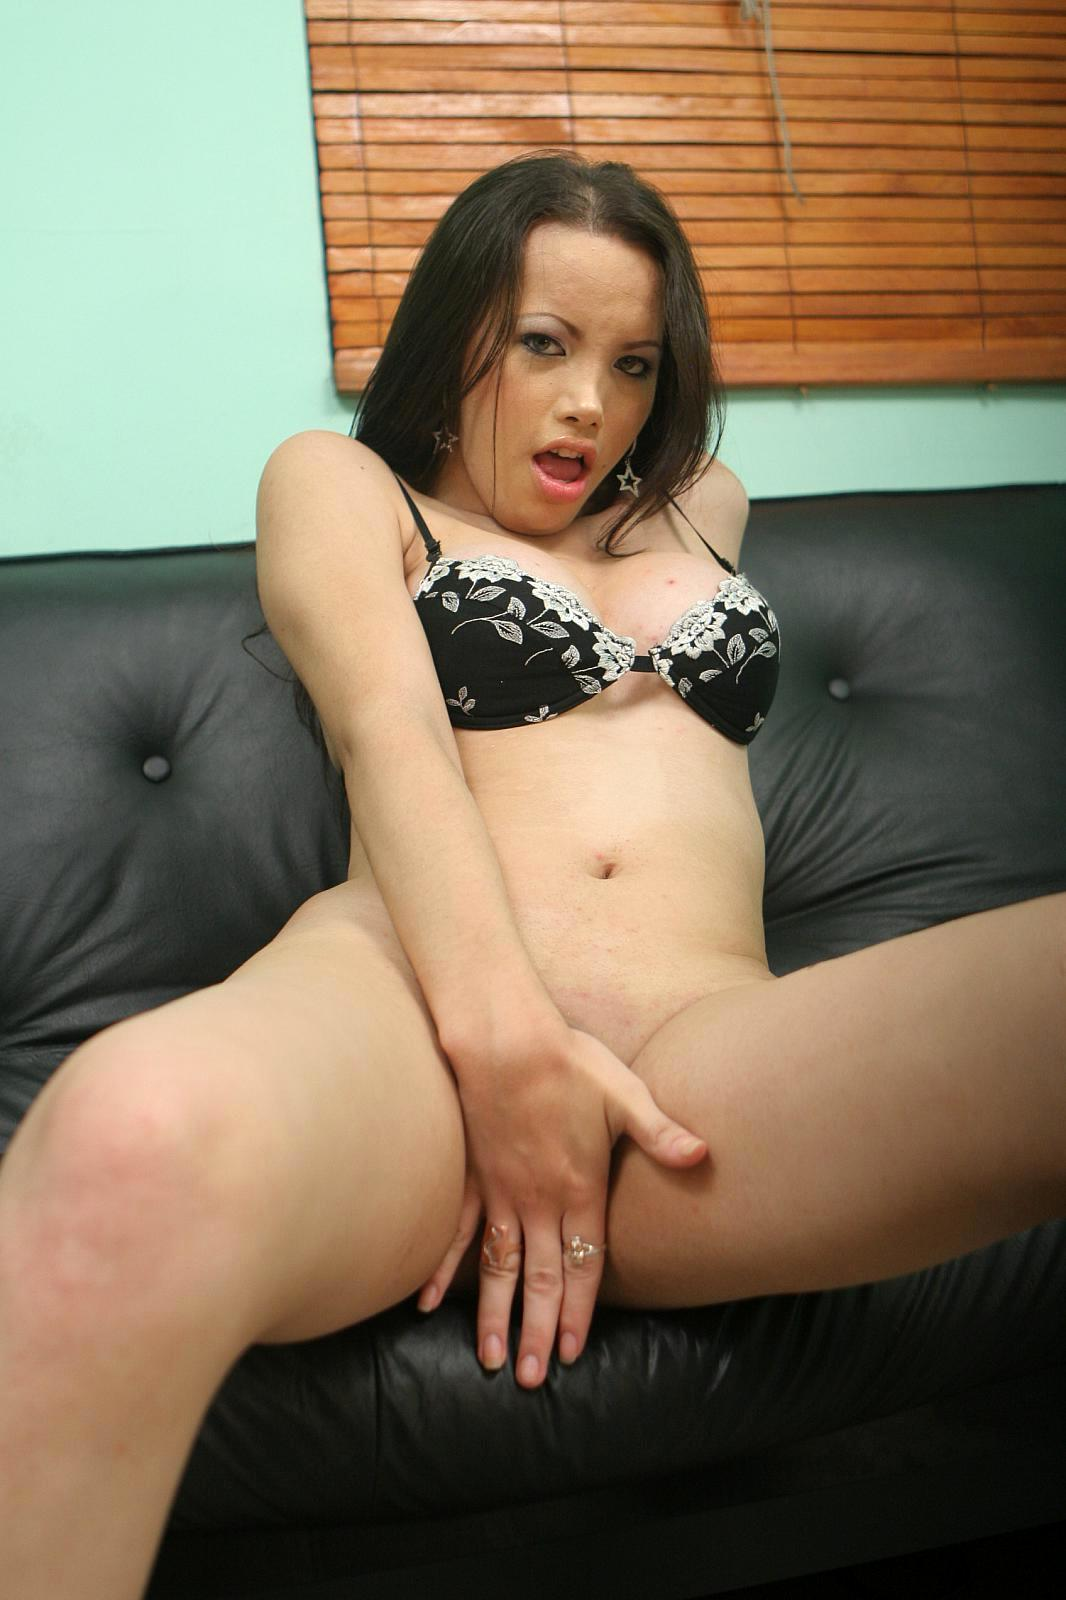 Filthy Ts Deborah Pleasing Her Eager Tool Until She Jizzes